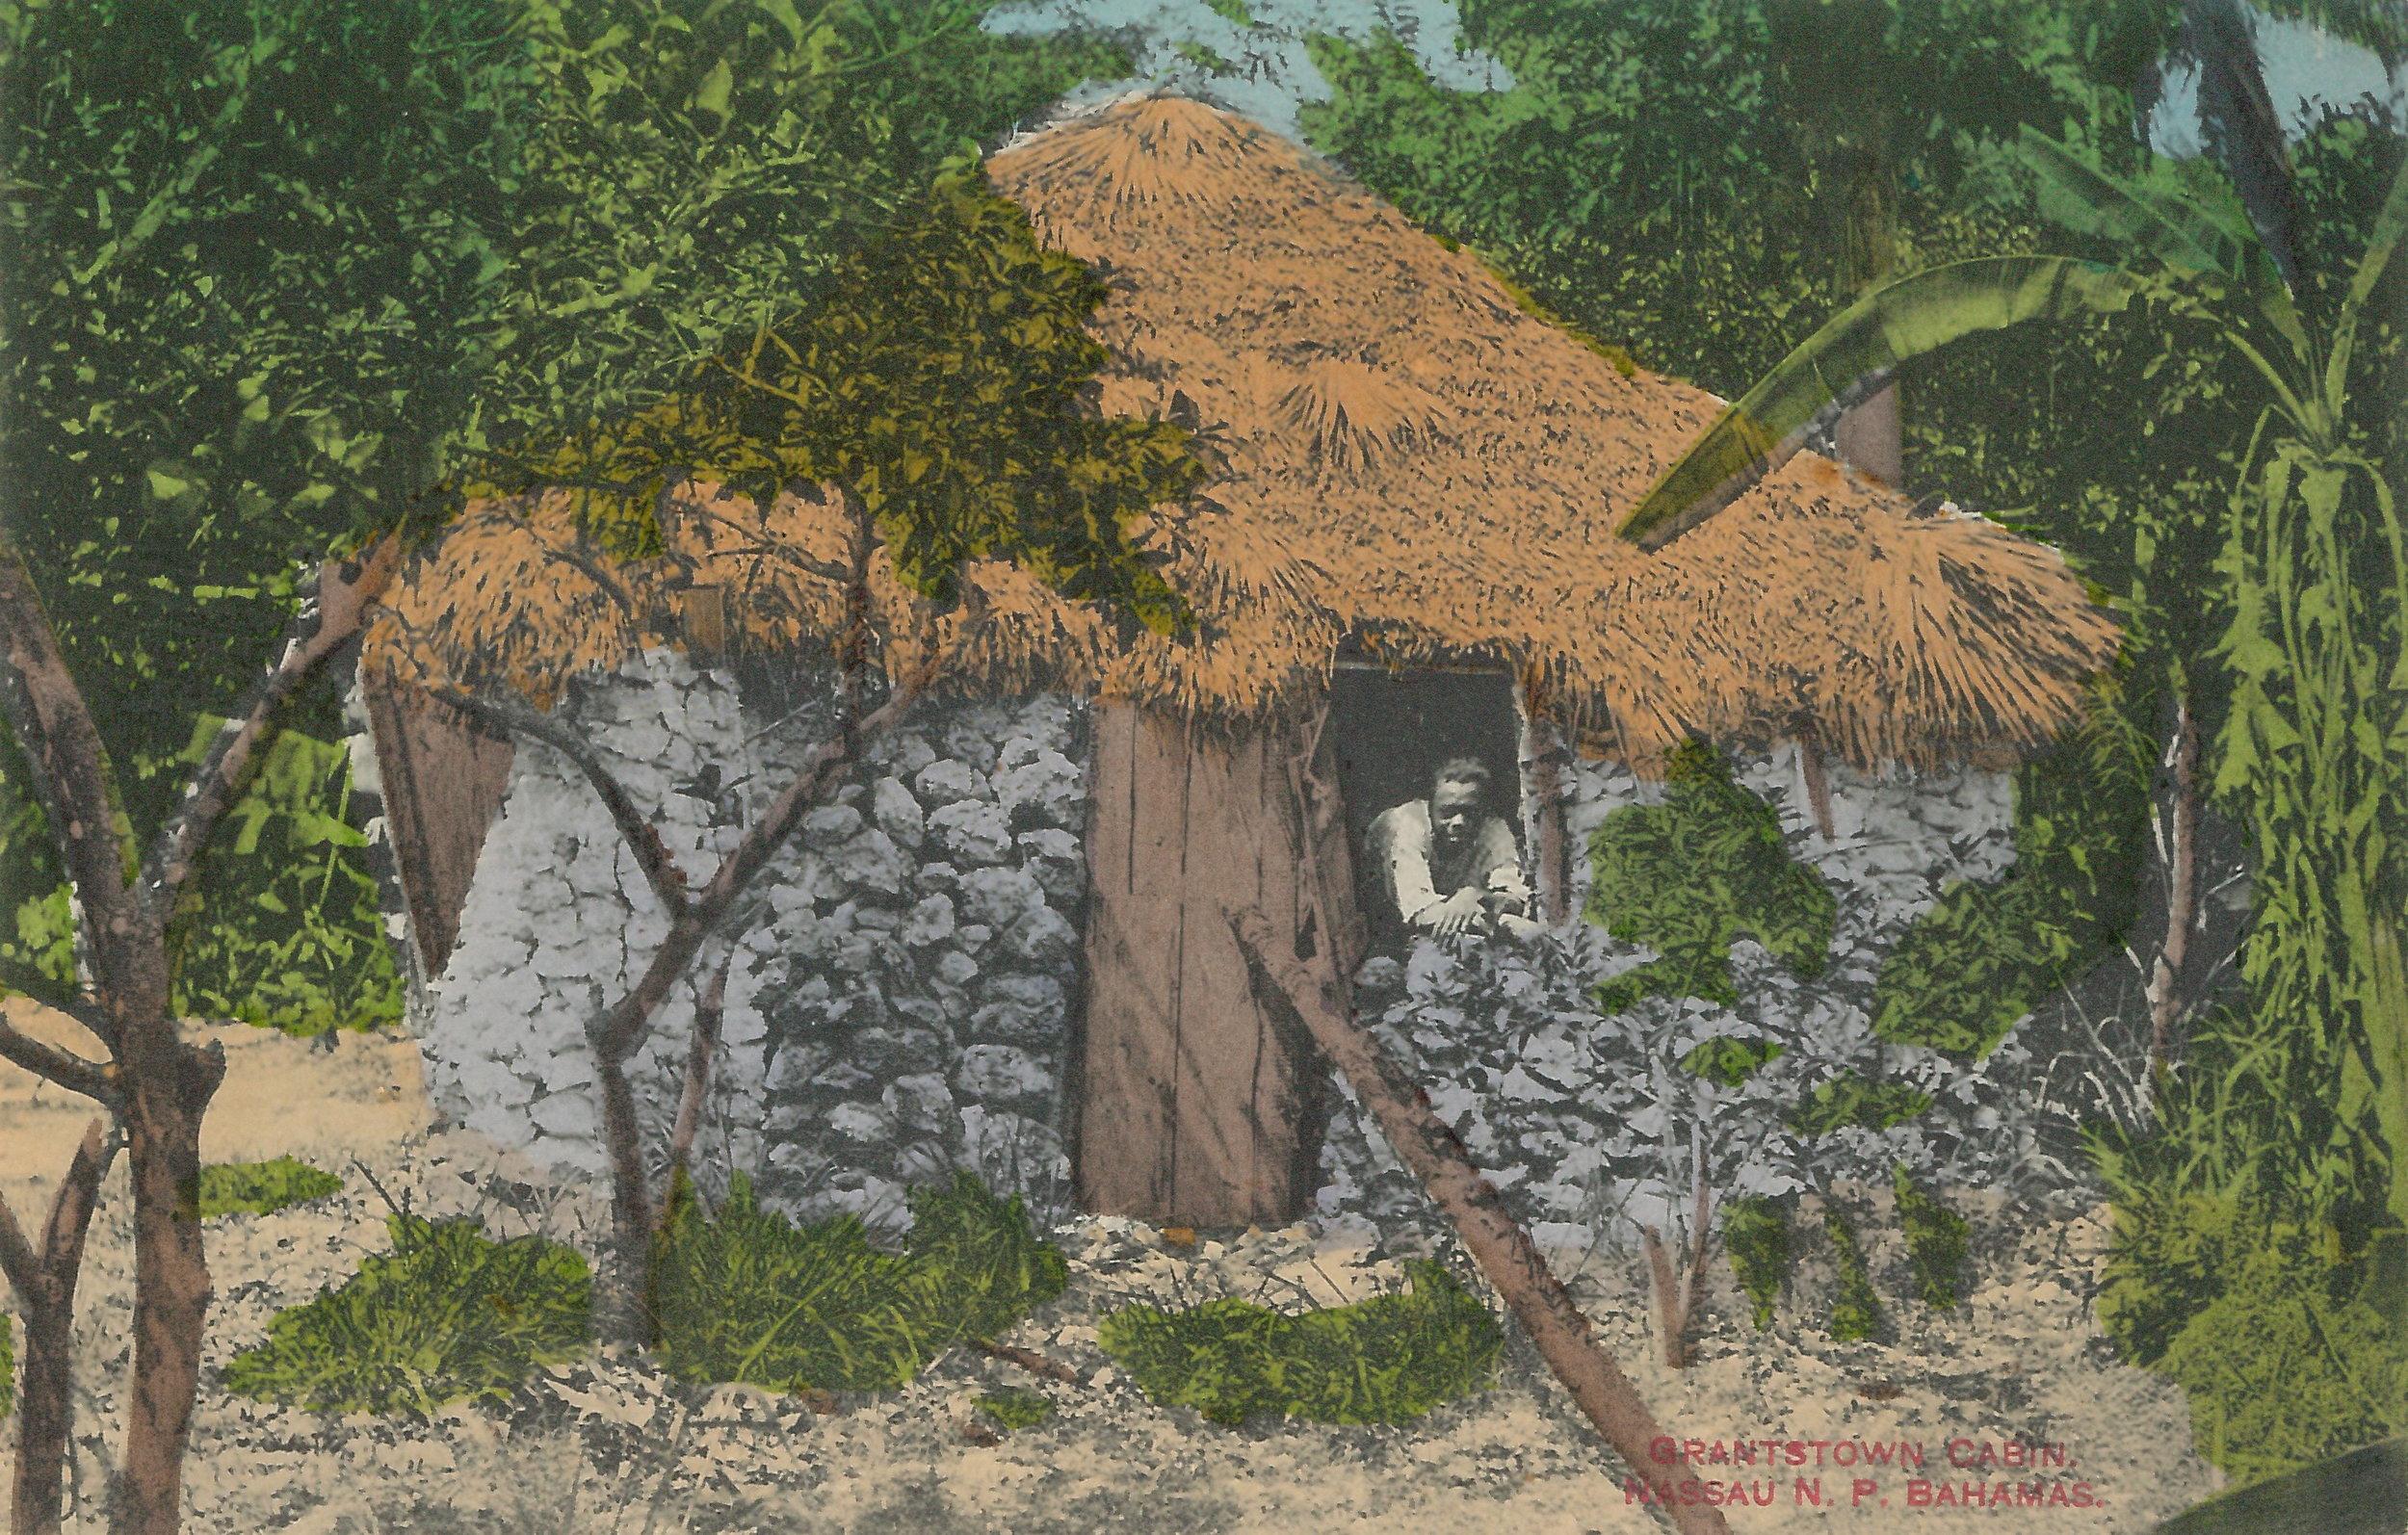 "'Grantstown Cabin' (estimated c.1890-1930), handcoloured colonial-era postcard by James ""Doc"" Sands."